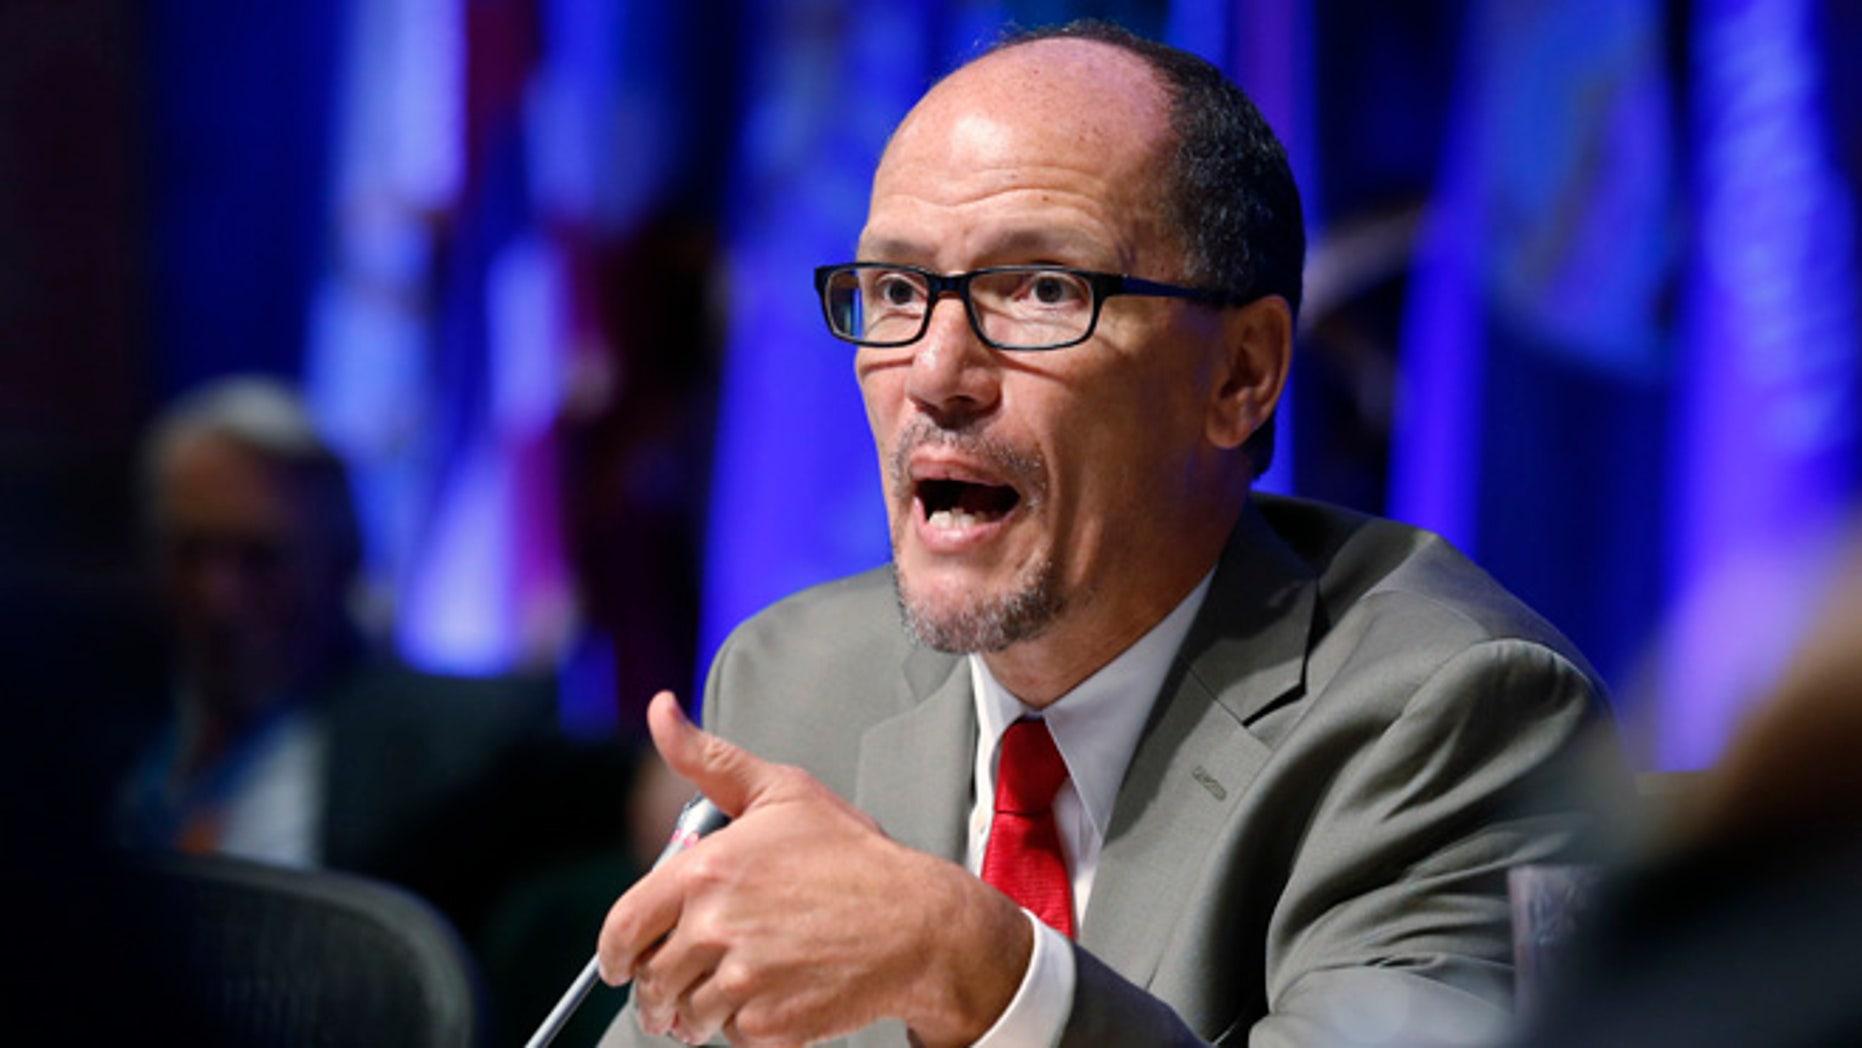 July 25, 2015: Labor Secretary Thomas Perez speaks in West Virginia.